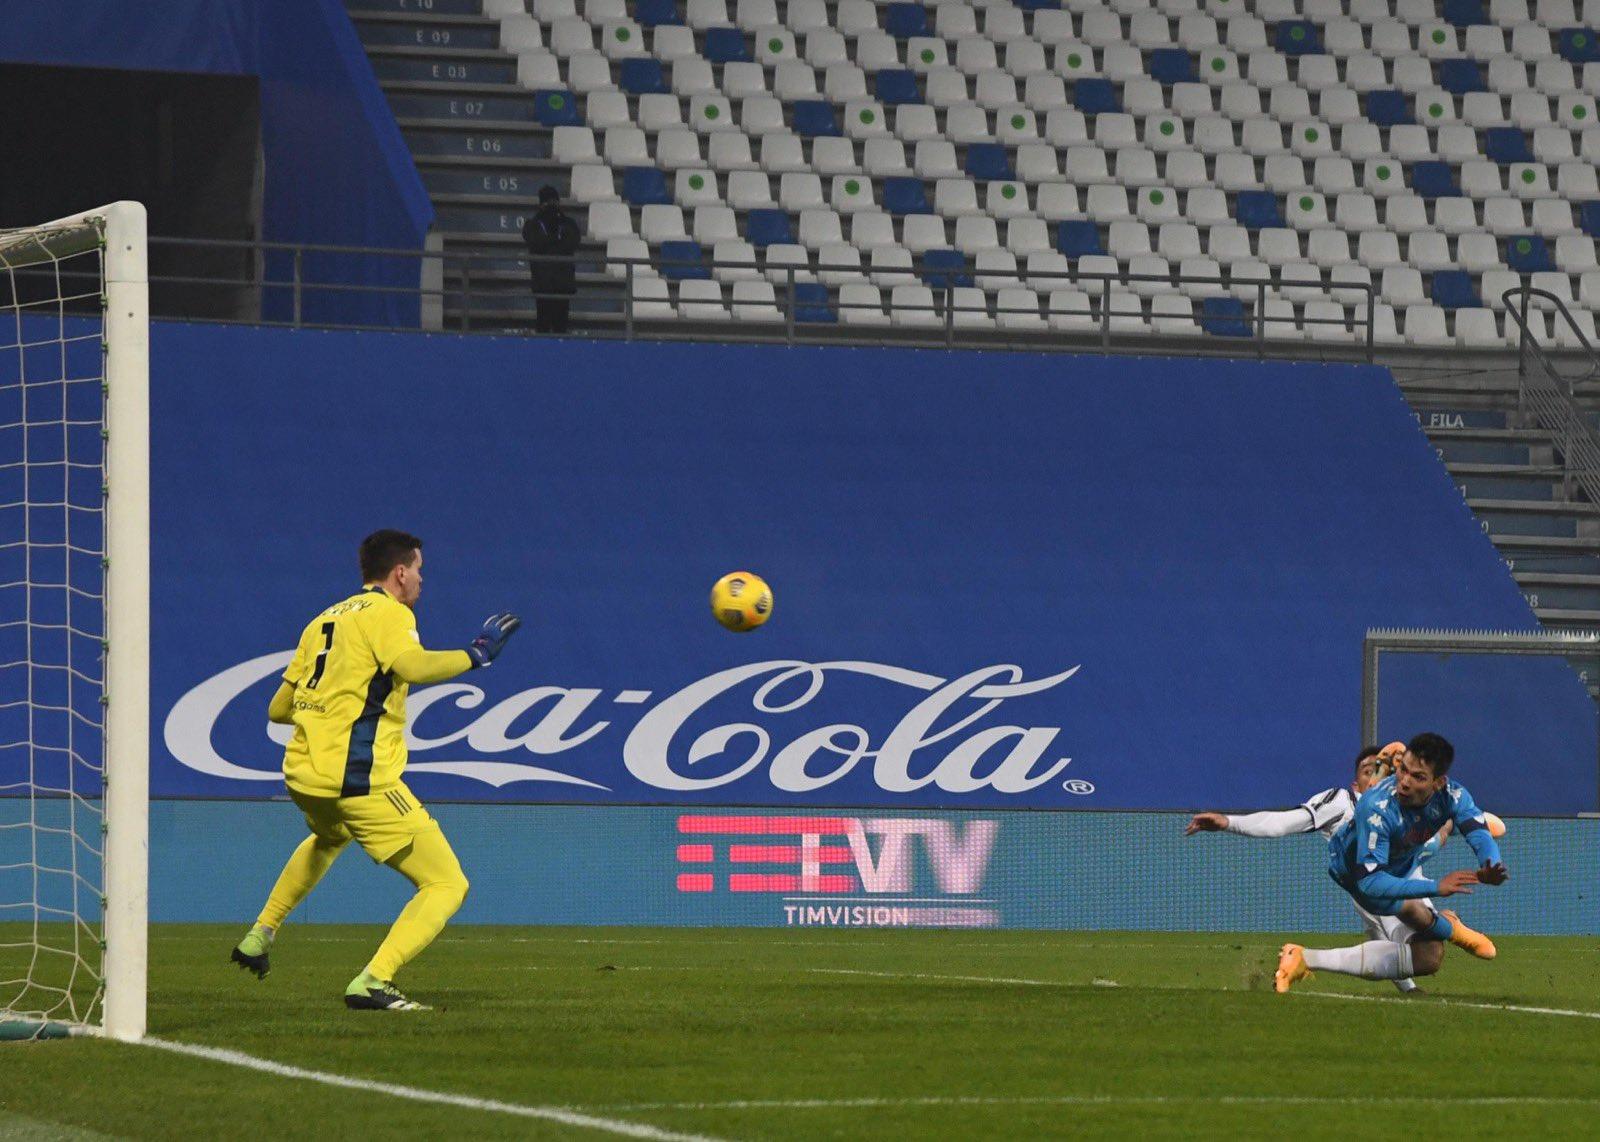 Juventus-Napoli 2-0: ai bianconeri la Supercoppa - PianetaGenoa1893